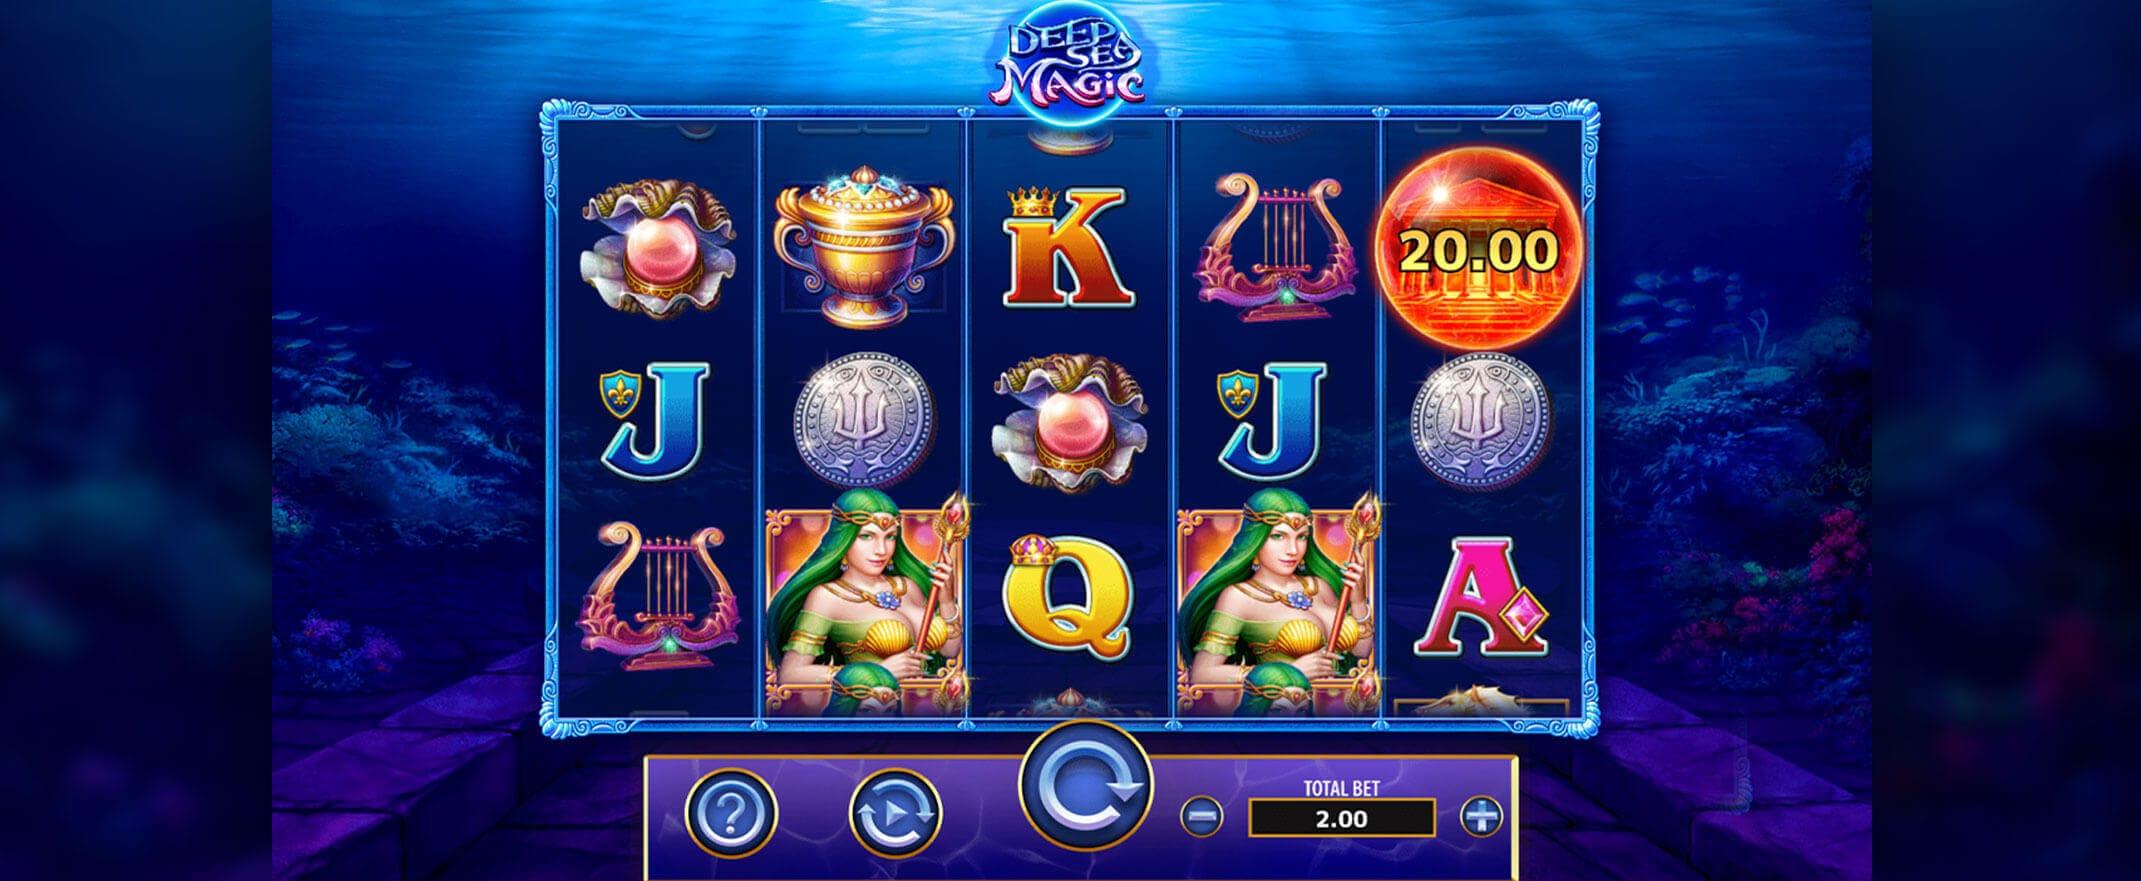 Deep Sea Magic Slot Gameplay